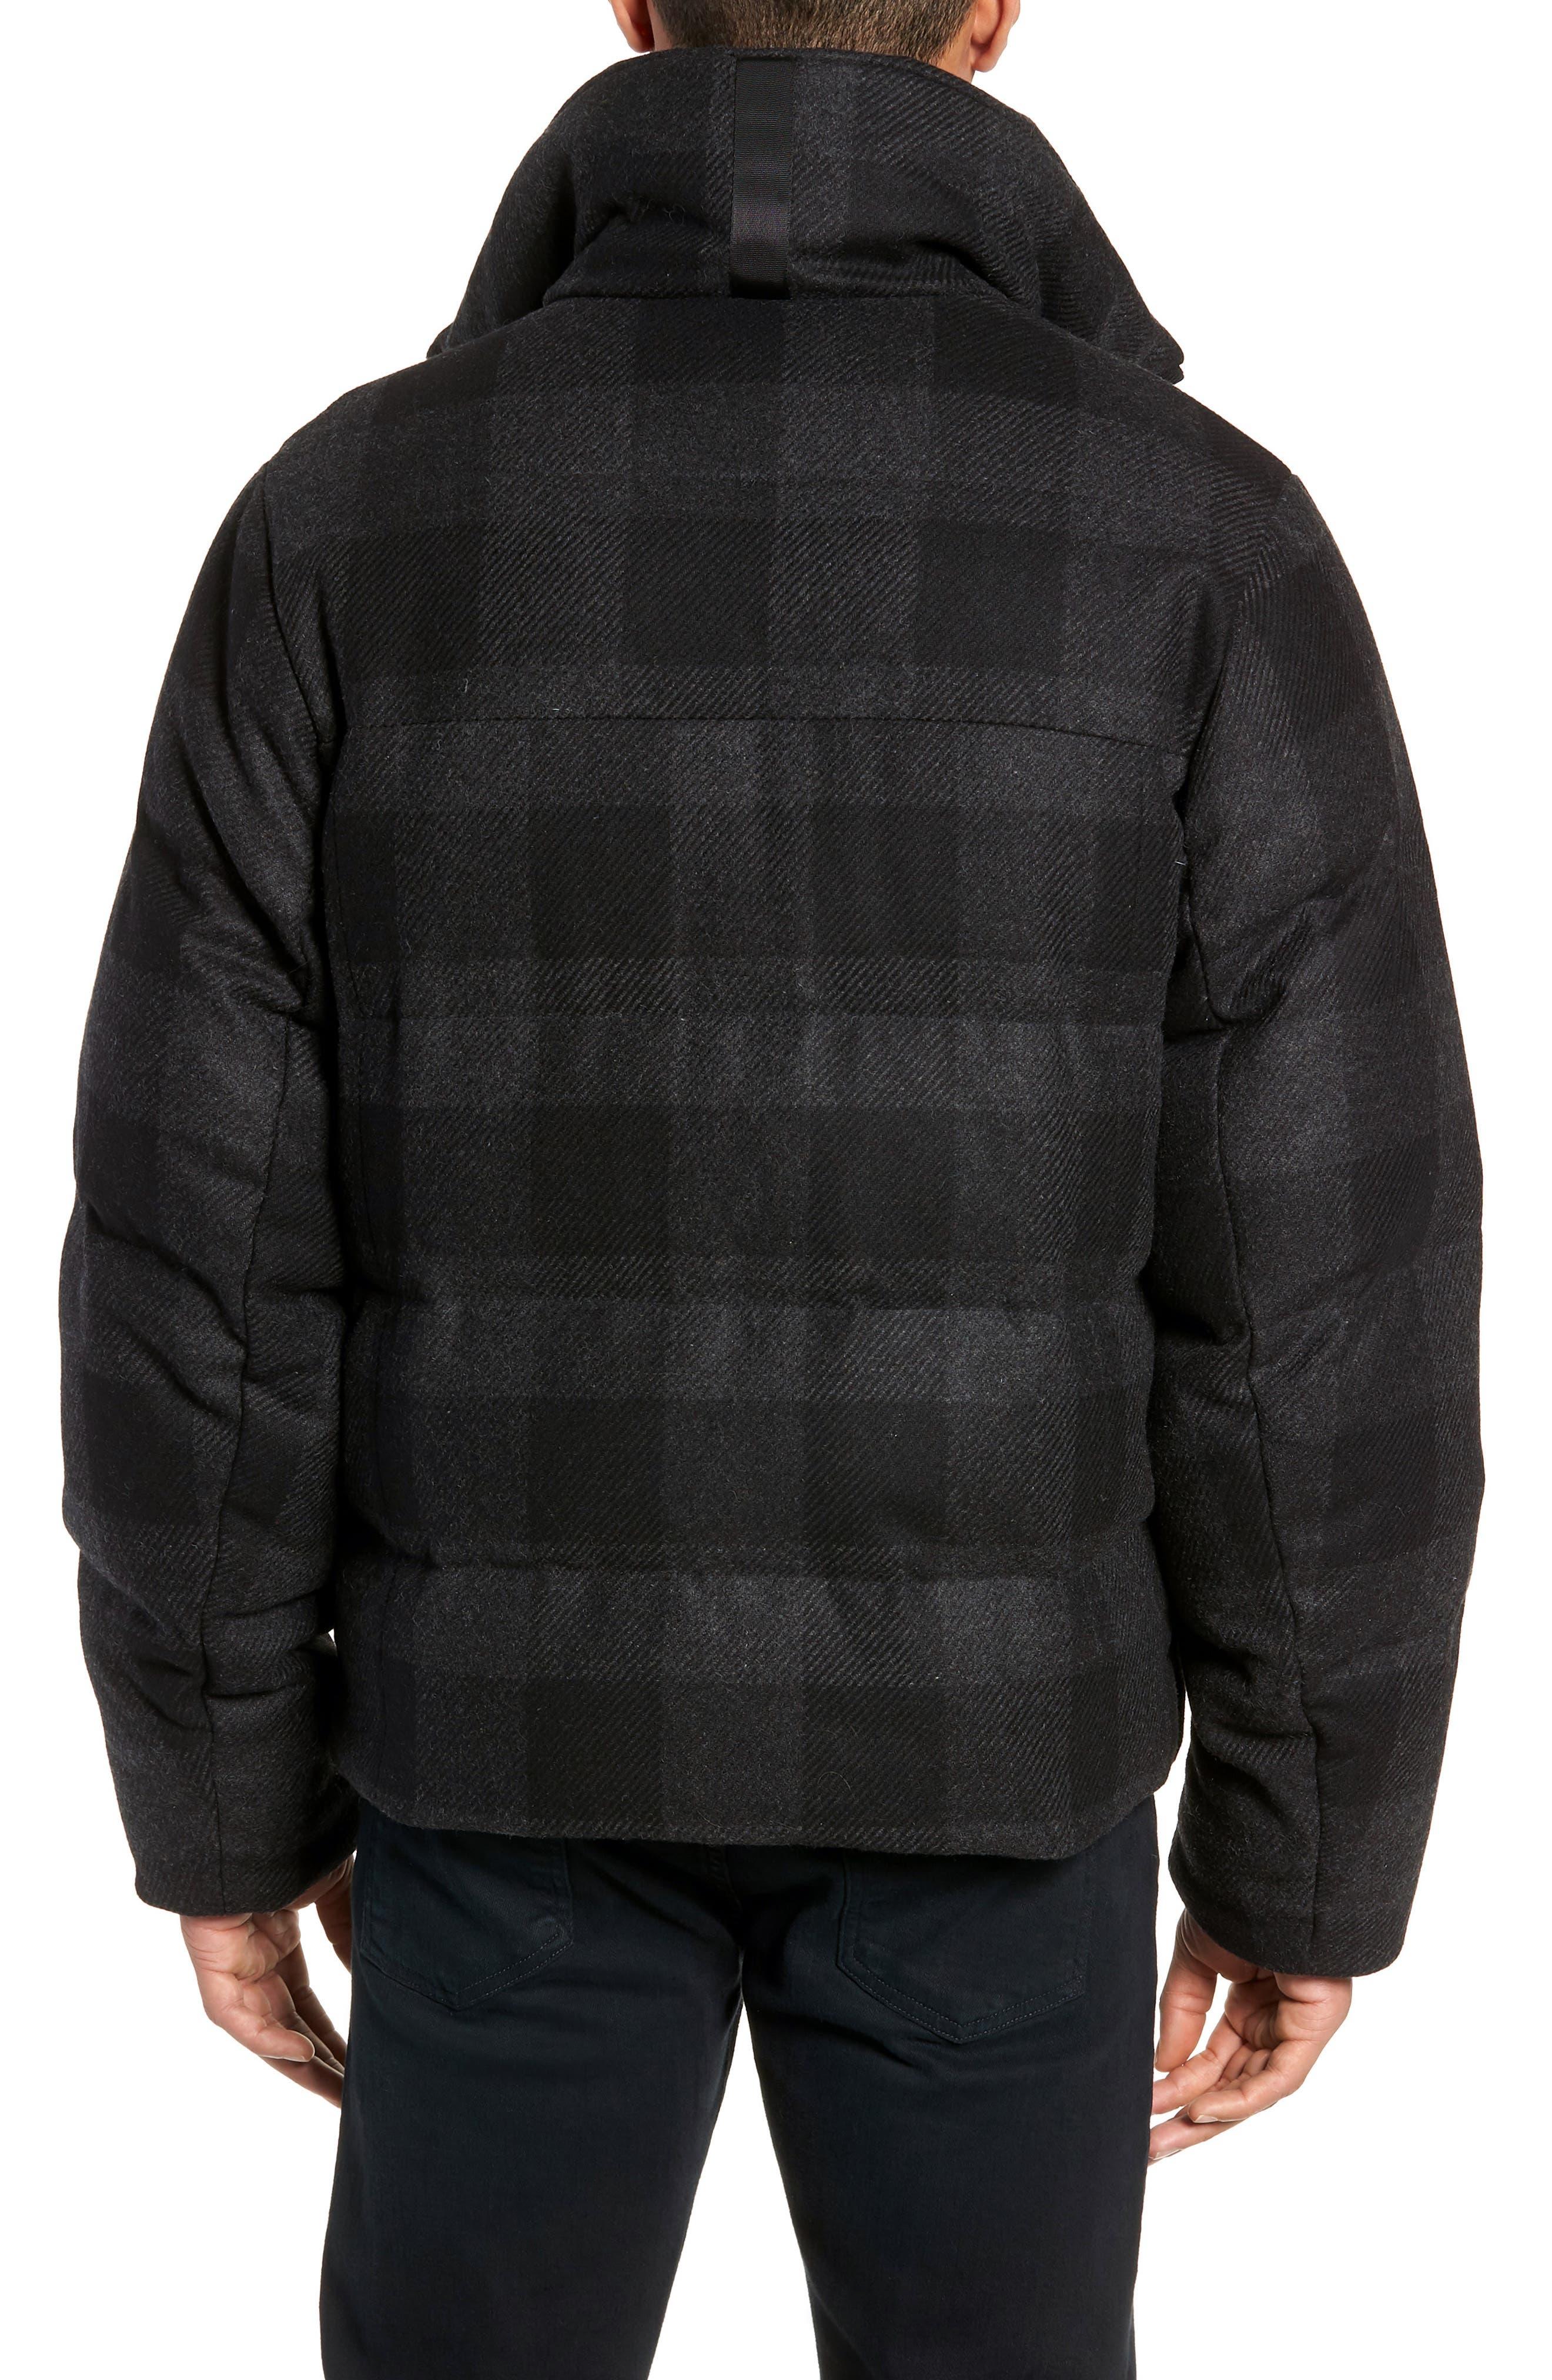 Crosby Plaid Wool Bib Puffer Jacket,                             Alternate thumbnail 2, color,                             CHARCOAL/ BLACK PLAID